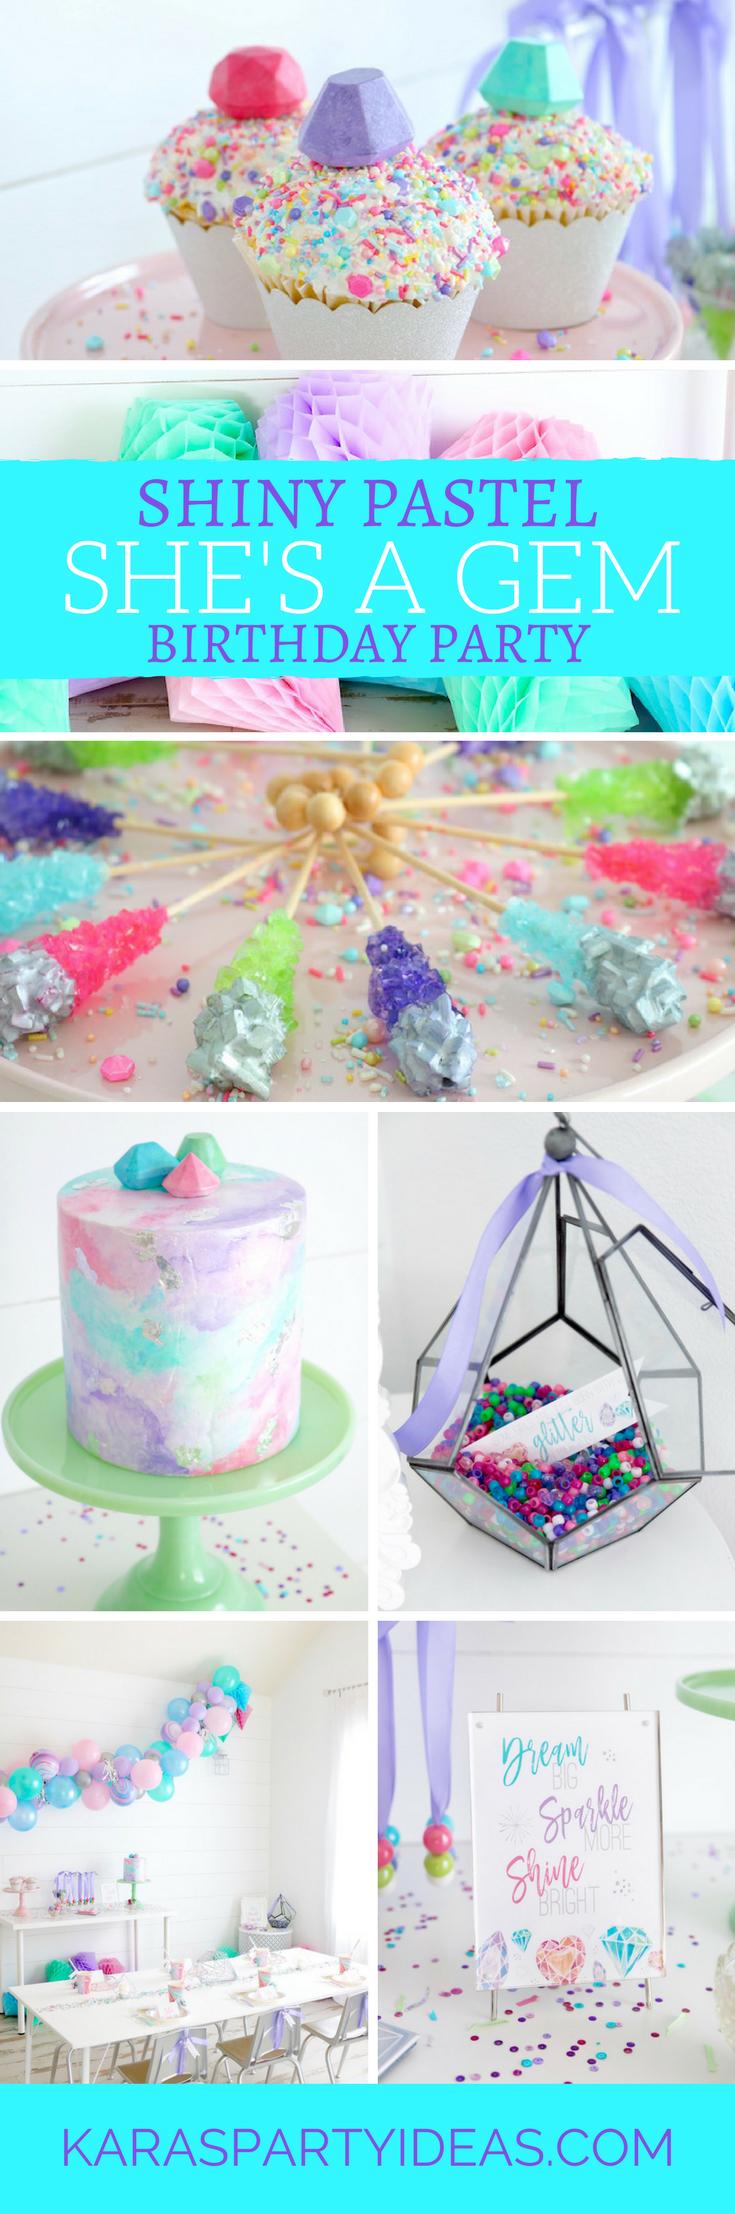 Shiny Pastel She's a Gem Birthday Party via Kara's Party Ideas - KarasPartyIdeas.com